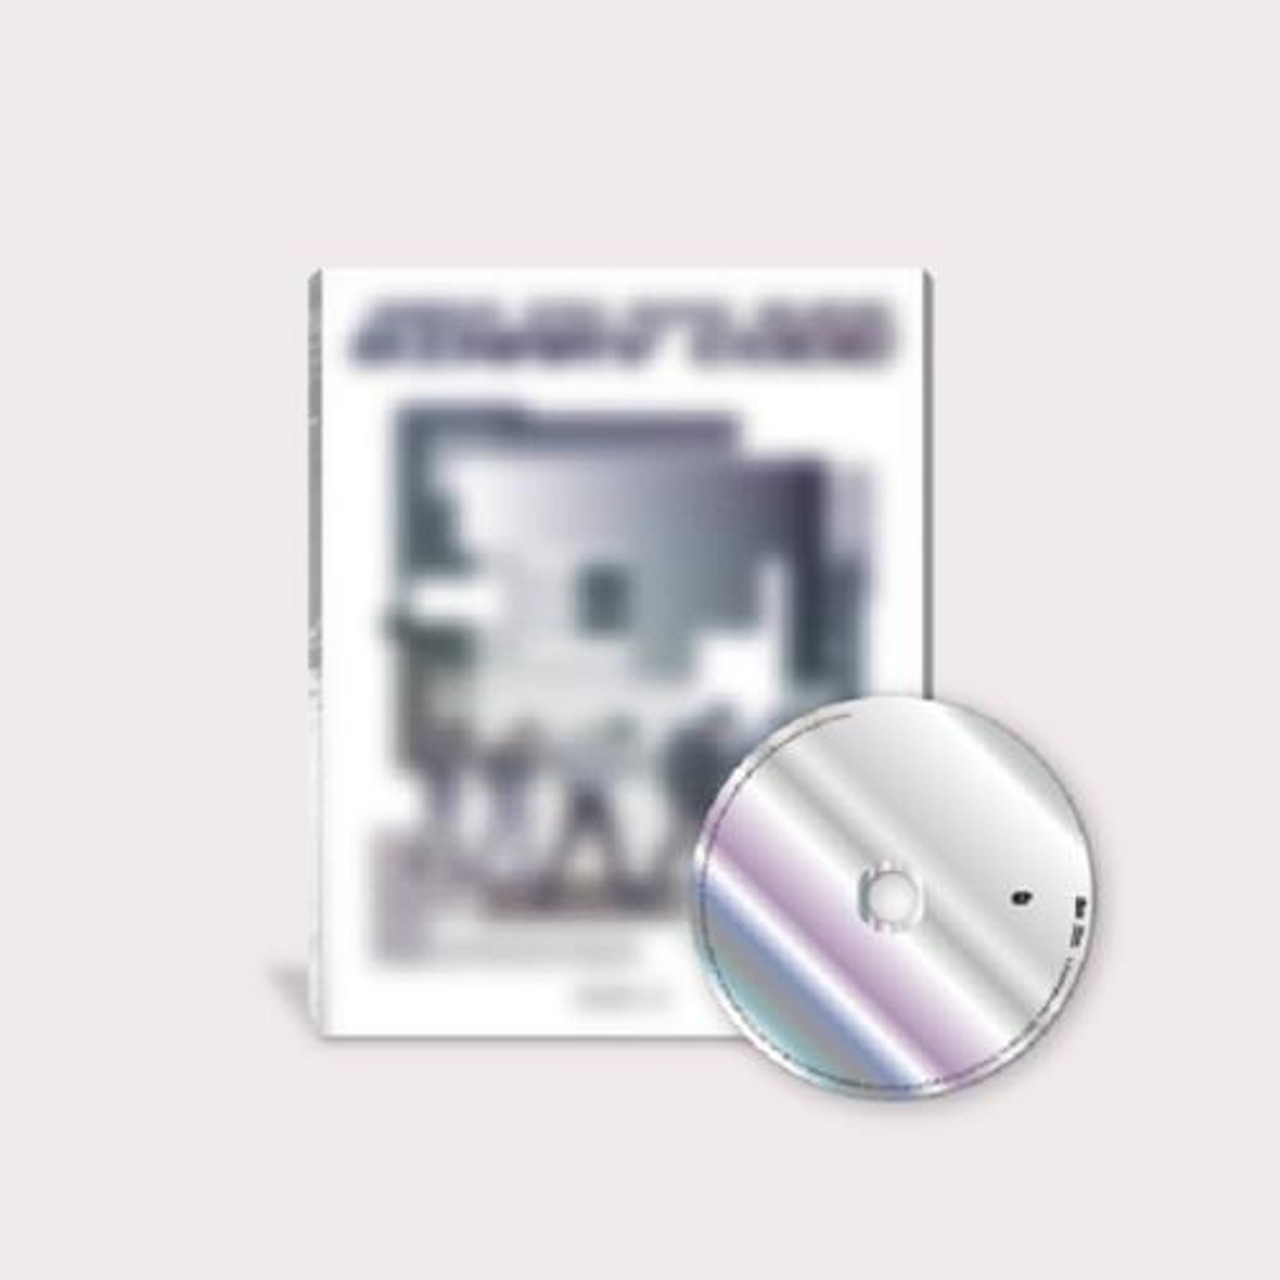 ONEUS - 5th Mini [BINARY CODE] (ZERO Ver.)